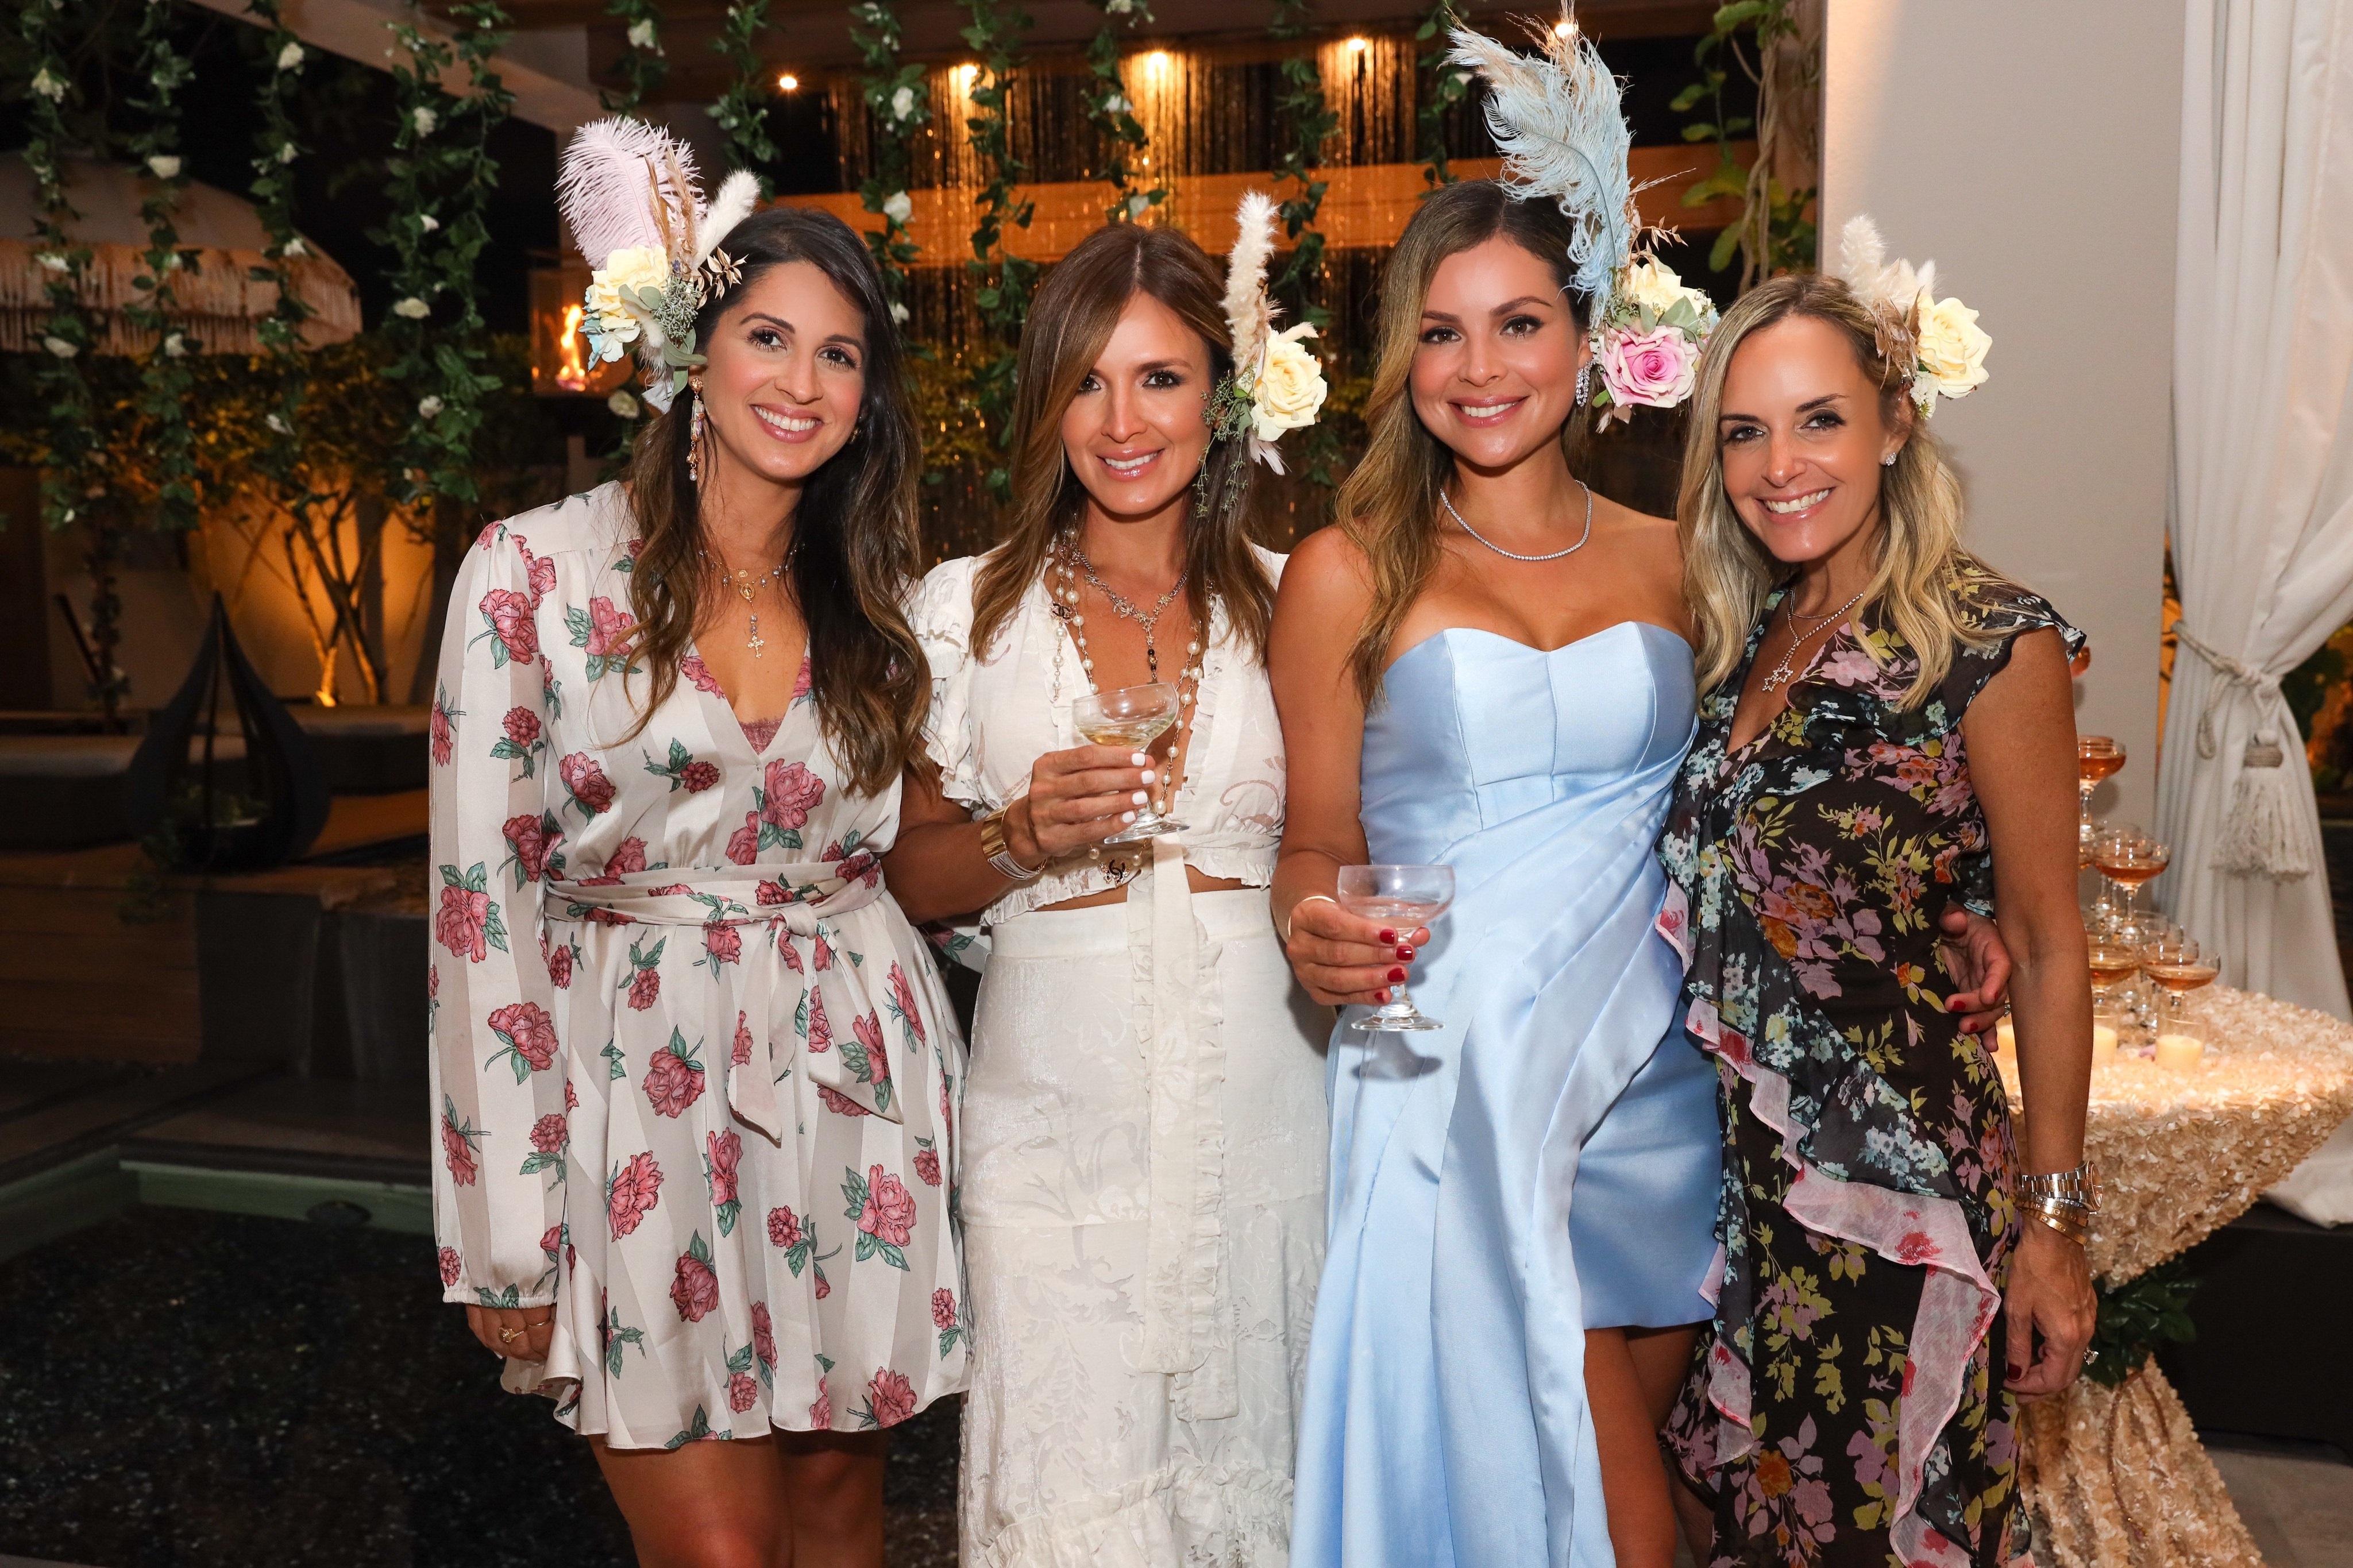 Natasha Laneras, Adriana Muentes, Mónica Ponce y Paola Freese. (Suministrada/Karina Margary)